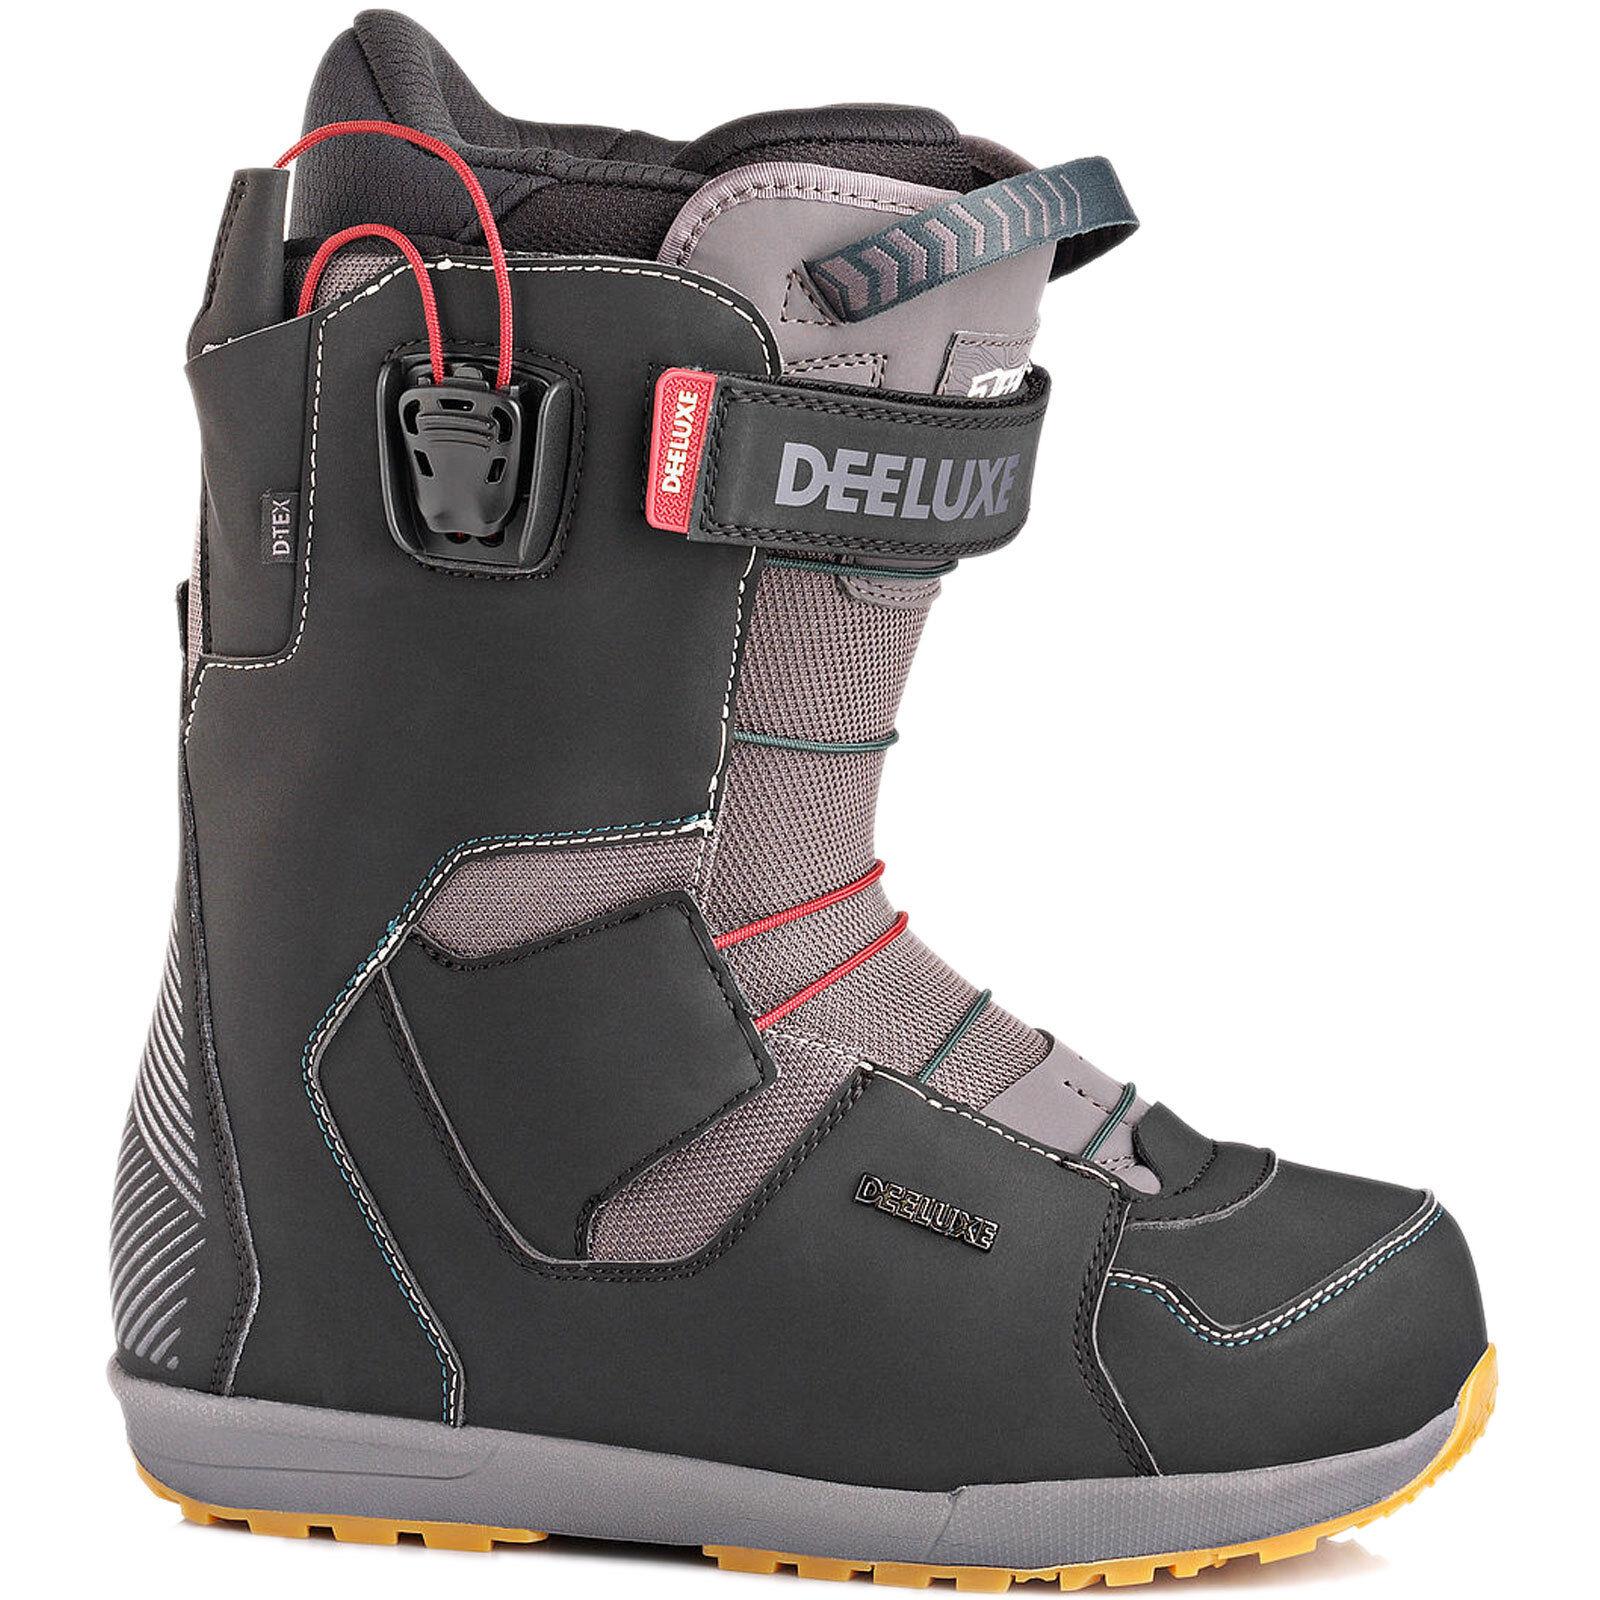 Deeluxe Deemon Tf Elias Uomo Snowboardstivali Stivali Morbidi ThermoLiner 2018 2018 2018 340ef2